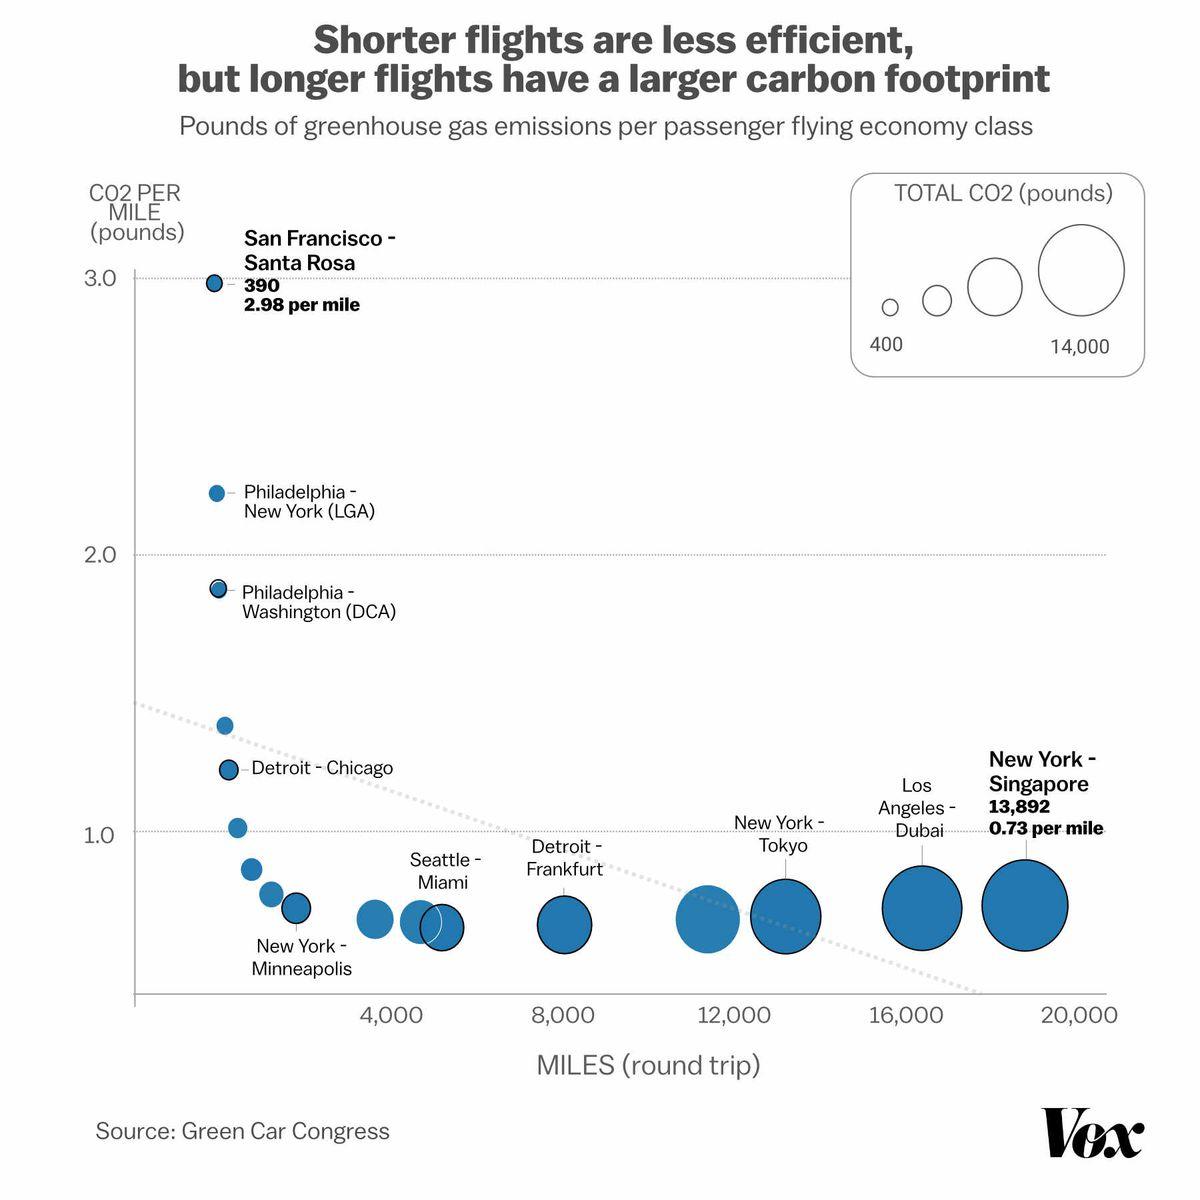 Graphic showing pounds of Co2 emission per passenger: shorter flights are less efficient, but longer flights have a larger carbon footprint